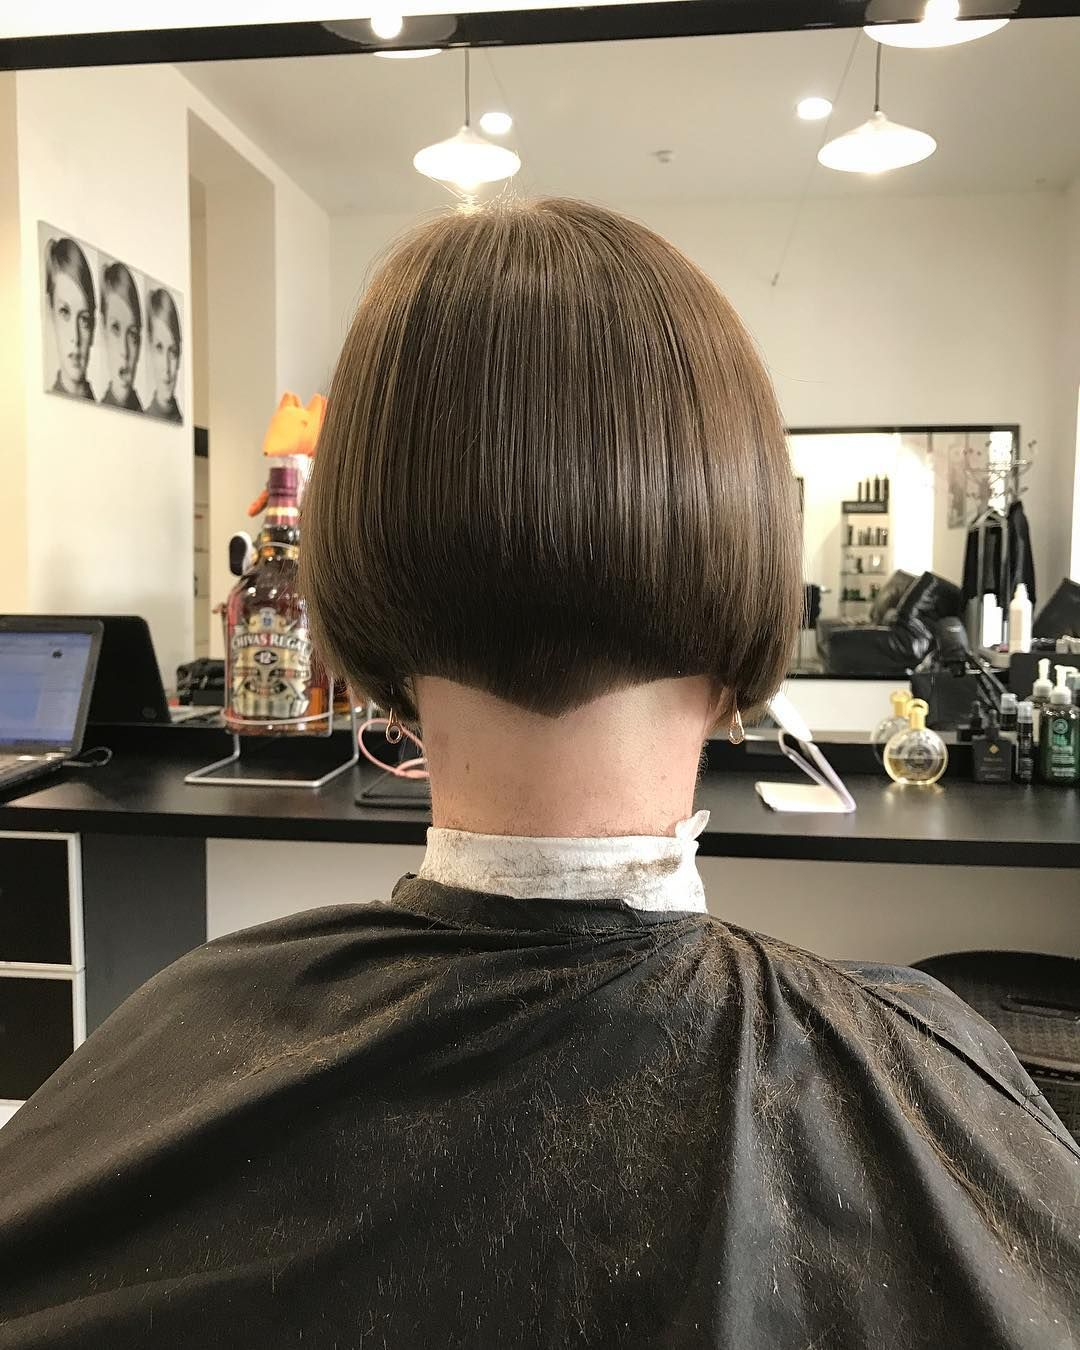 G graduation haircut bobhaircut sassoon paulmitchell